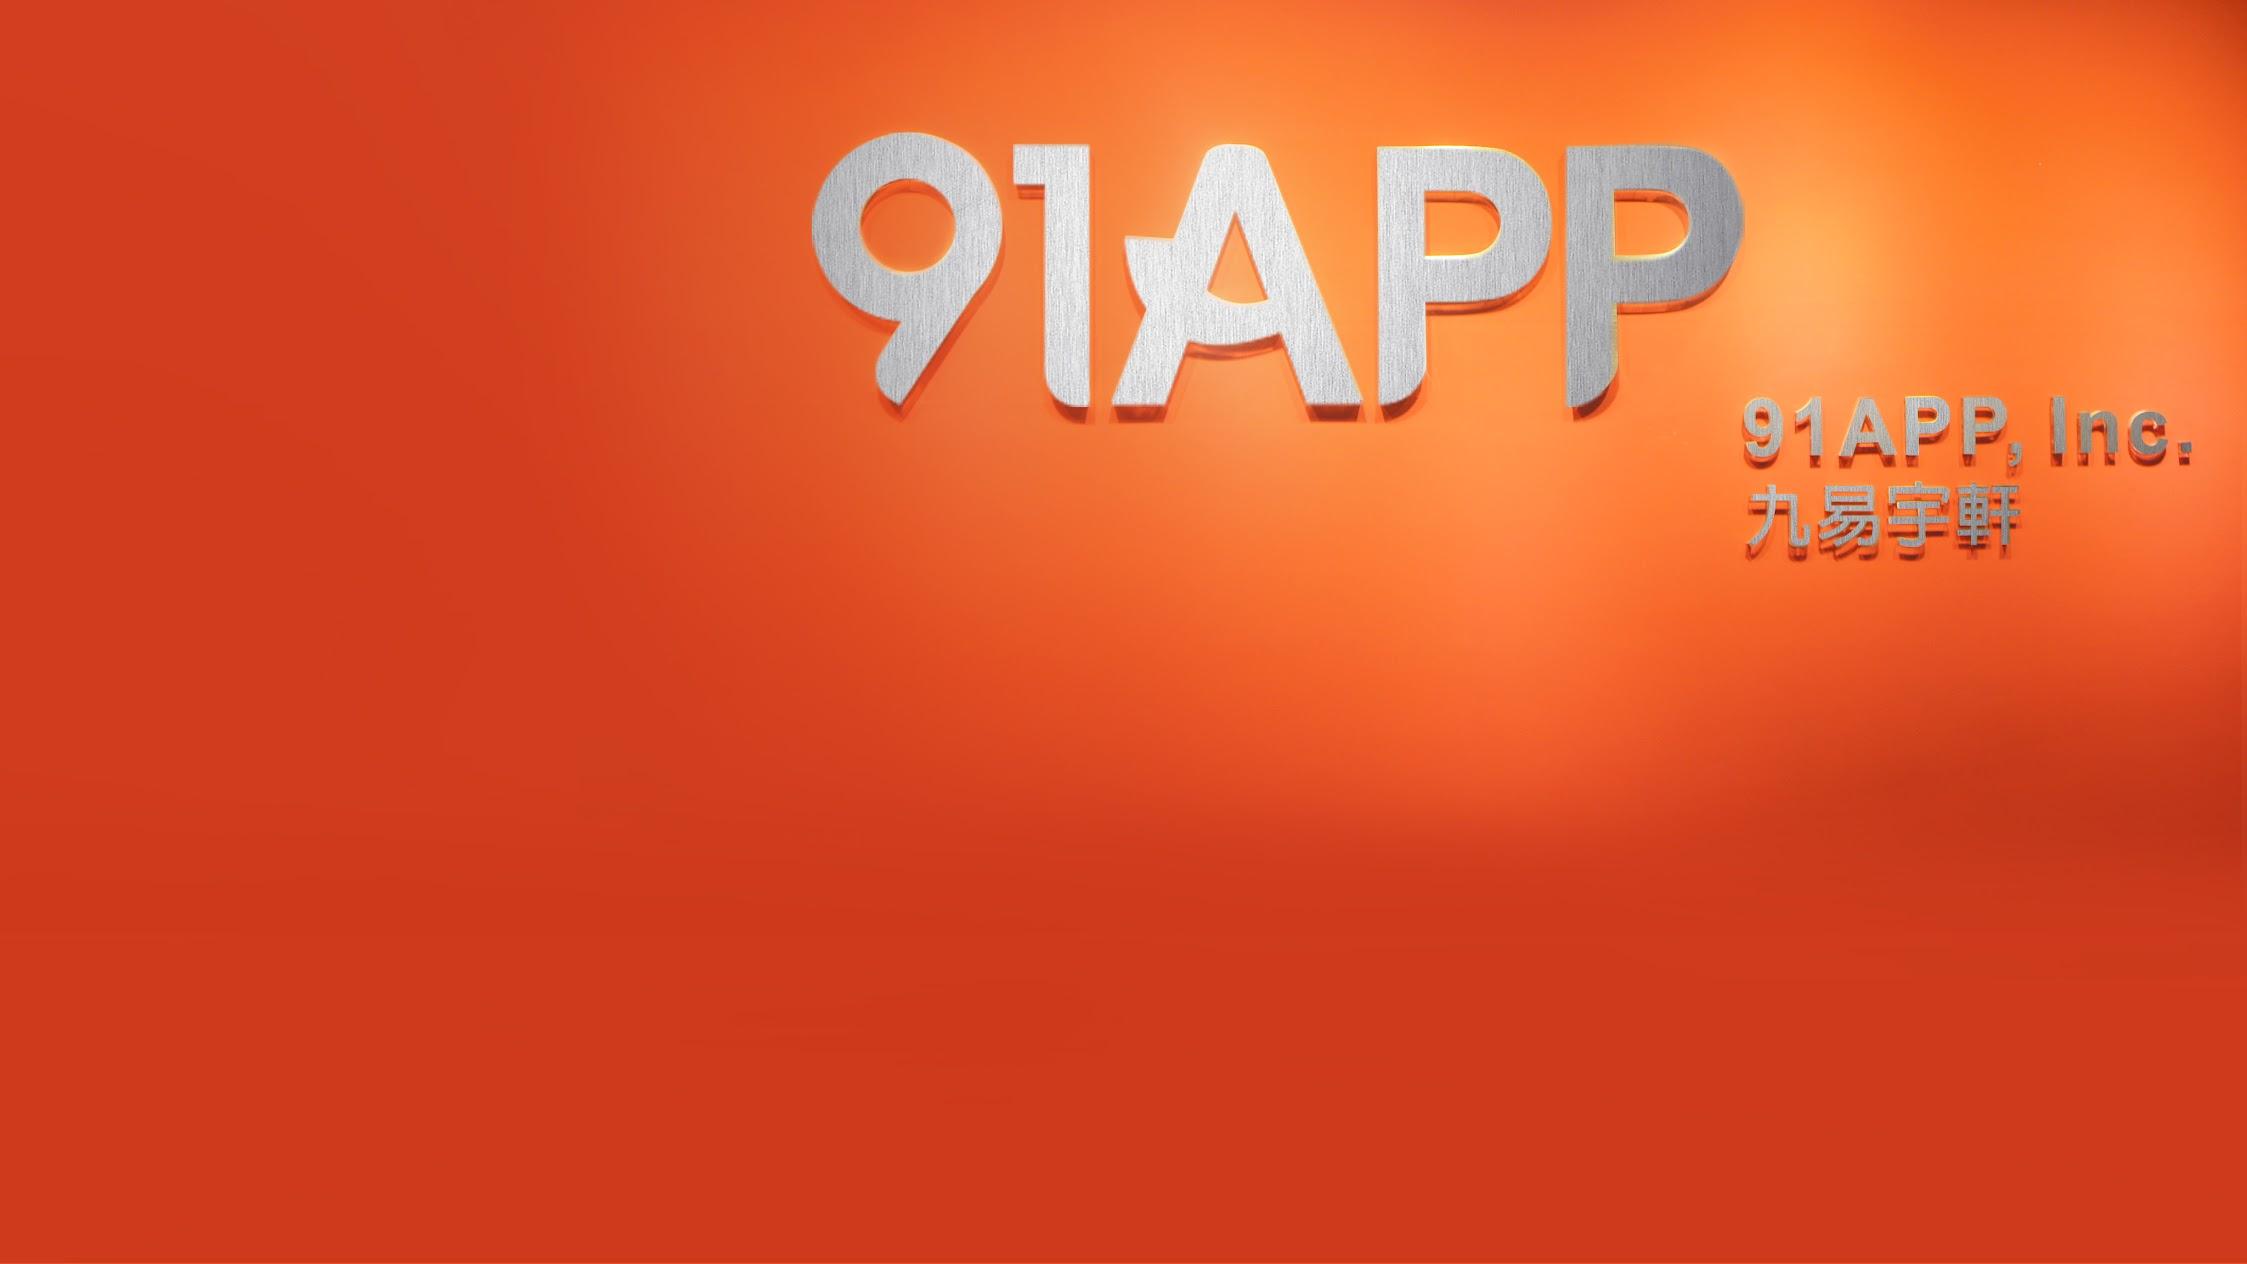 91APP, Inc. (9)